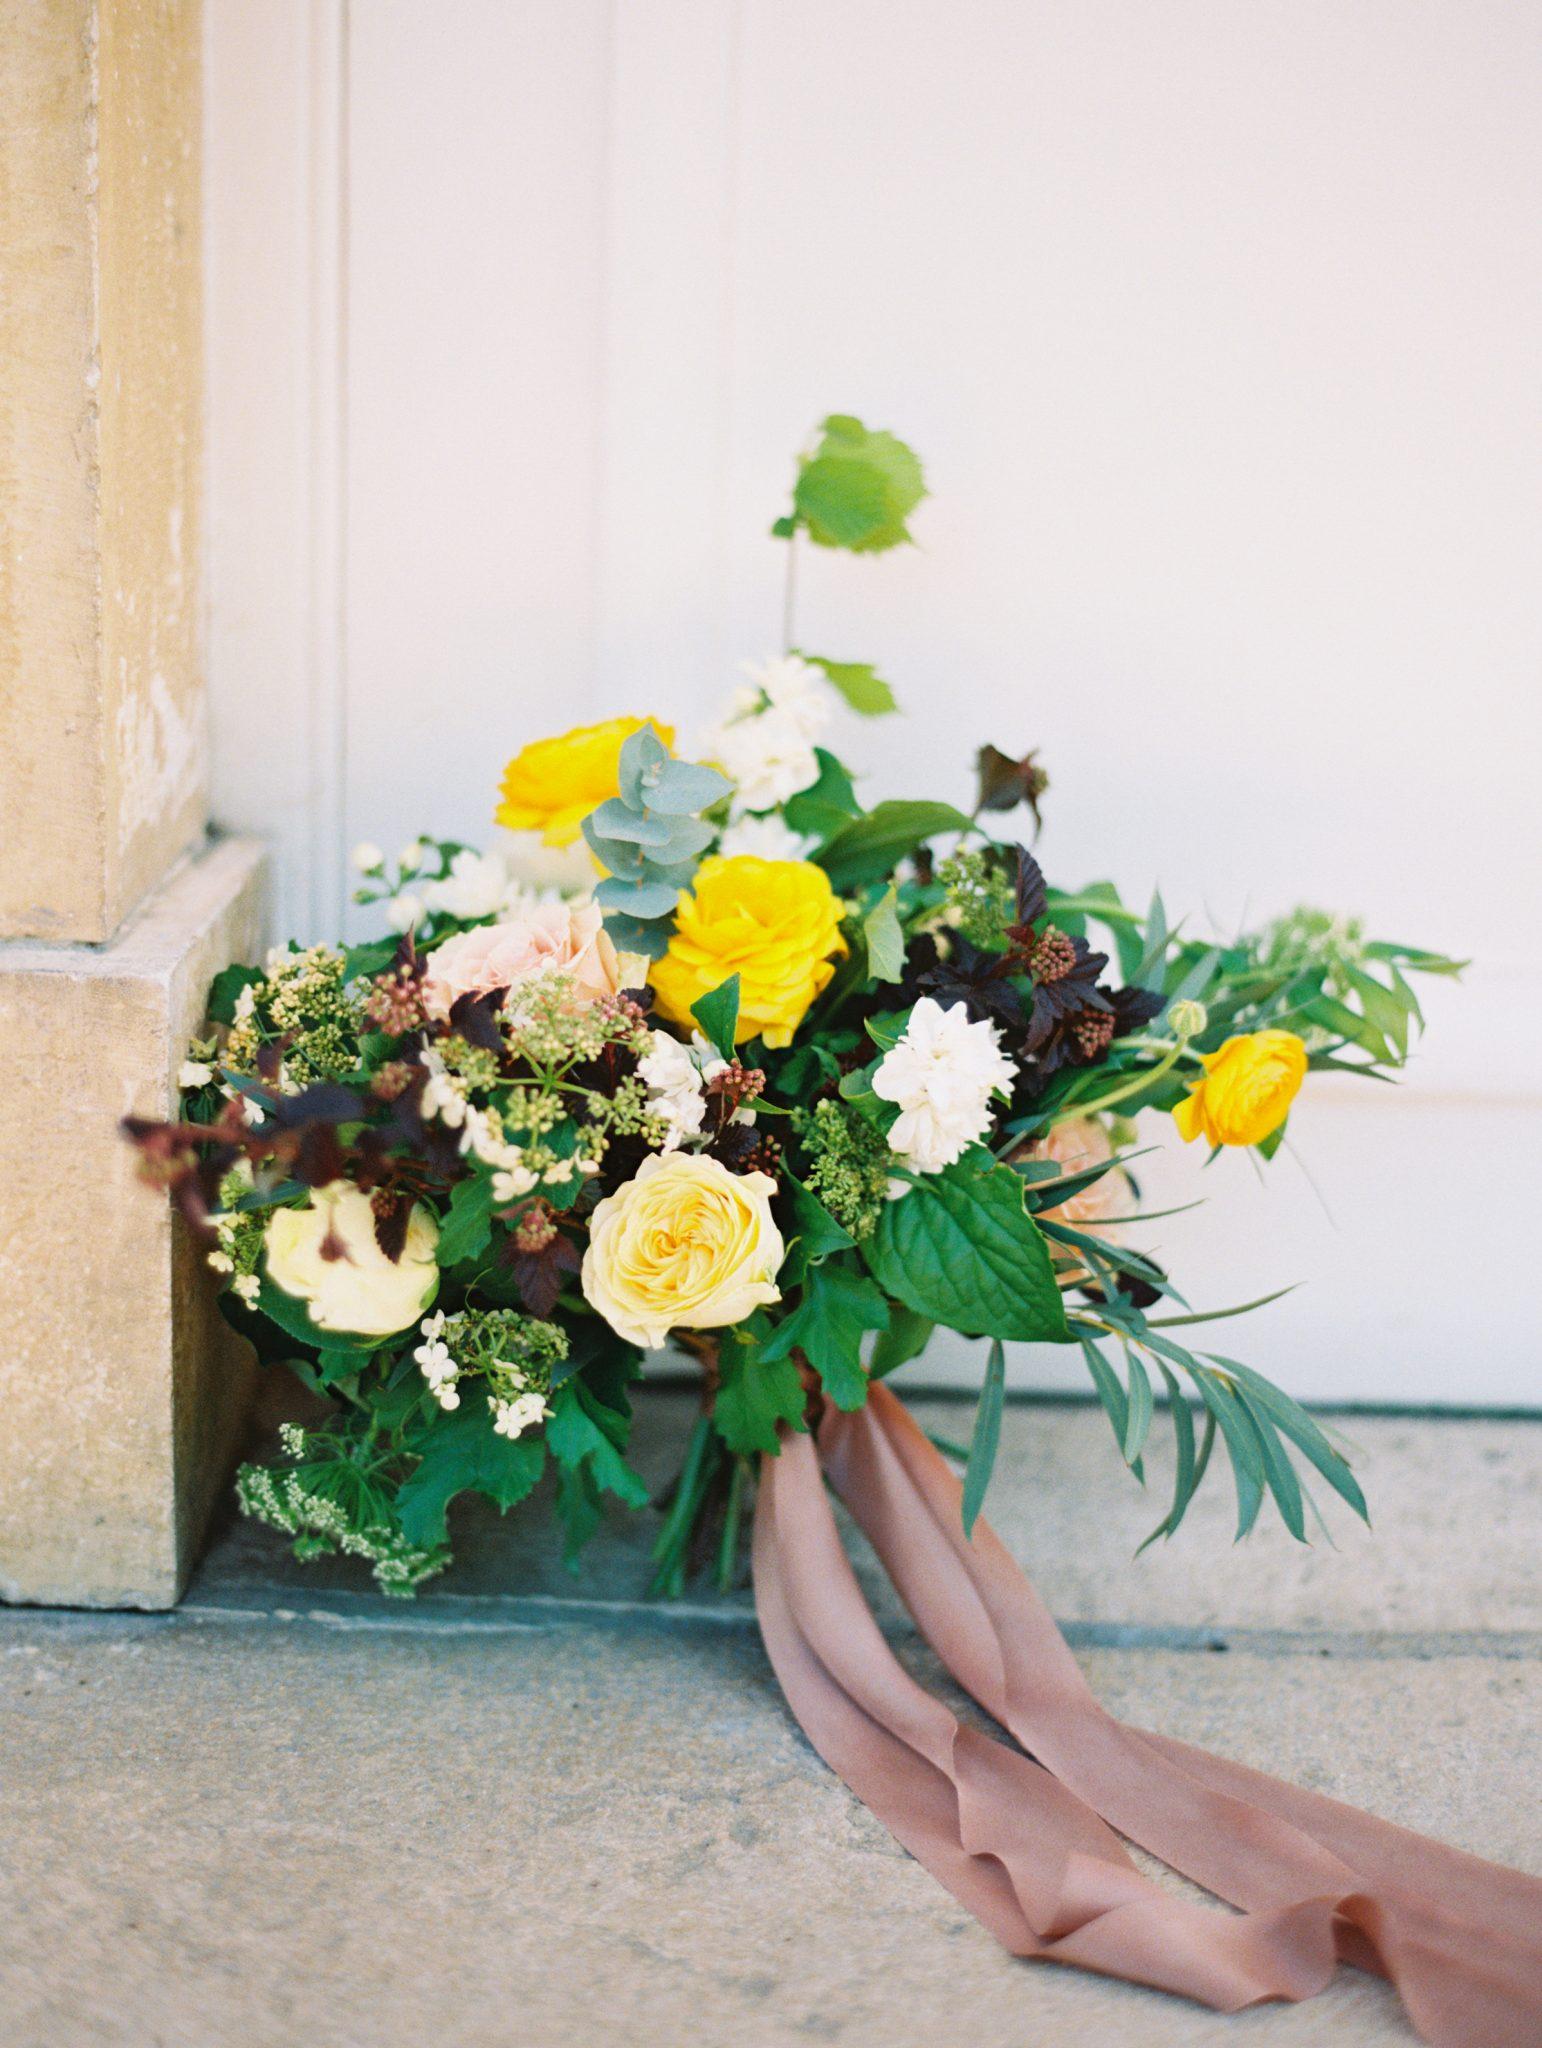 JaunePivoine-fleuristemariage-lyon17